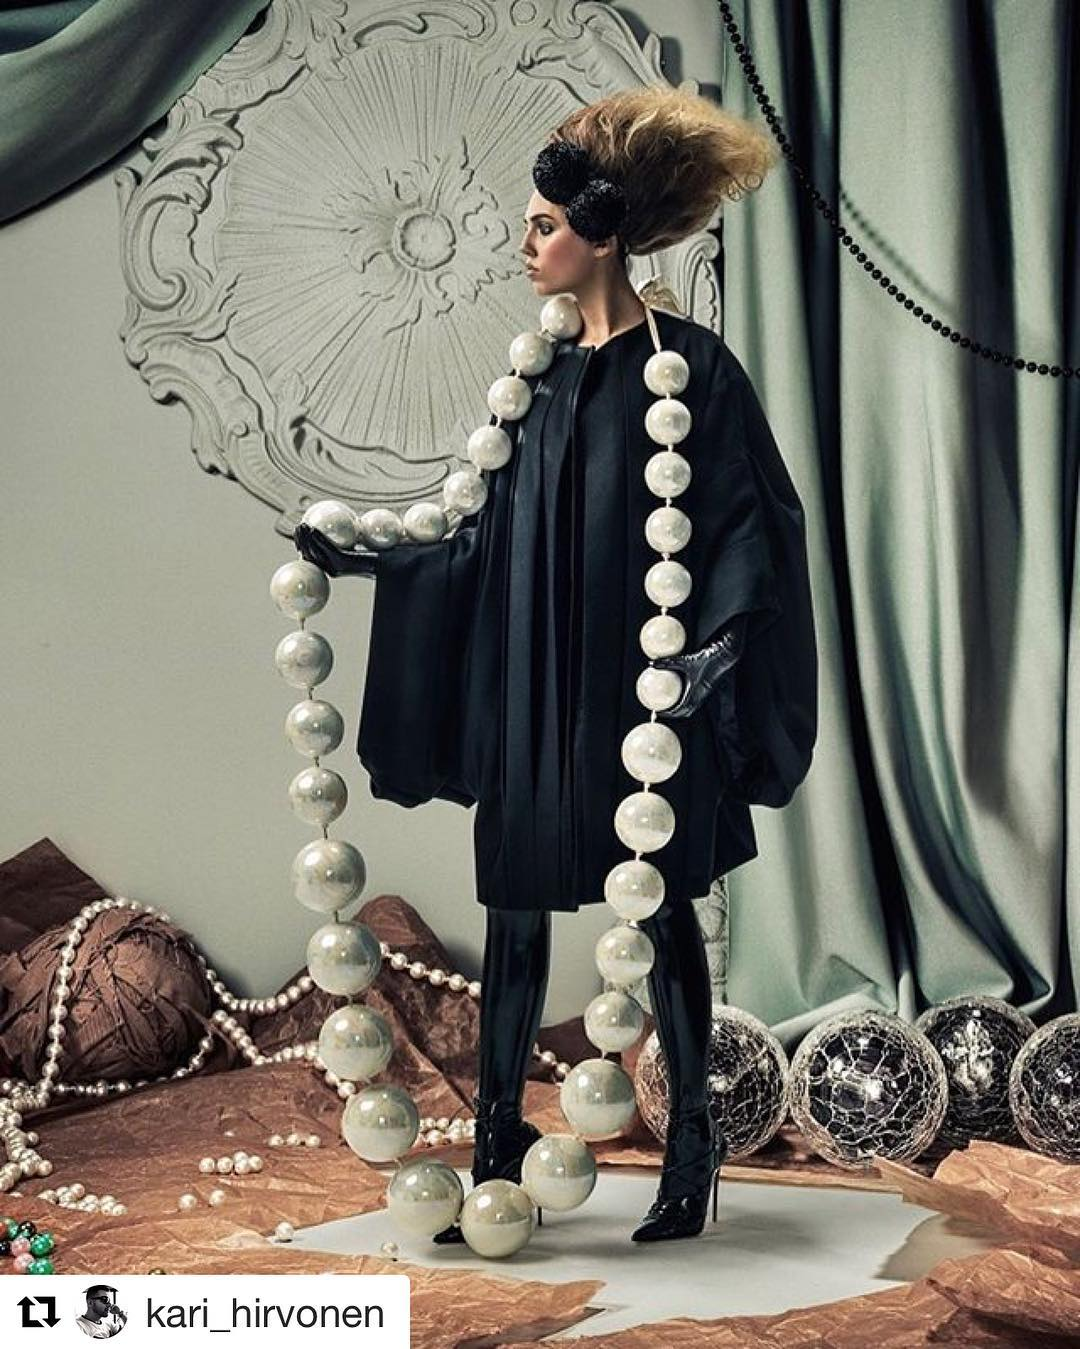 #tbt Thanks for the old shot! Regram from @kari_hirvonen ・・・ Total throwback! Amber Le Bon as Alice in pearls for Schön! magazine @schonmagazine Photo: @aorta_photo Hair: @marcialuvlocks Makeup: @jofrostmakeup Style: @kari_hirvonen assisted by @katietillyer Casting: @jncasting @amberlebonofficial is wearing @simon_ekrelius #simonekrelius #oversized #woolcoat @nicola_malkin #nicolamalkin #giantpearls #pearlnecklace @atsukokudolatex #atsukokudo #latex #latexstockings @louboutinworld #christianlouboutin #highheels #highheelshoes #stilettoheels #womenswear #womensfashion #schonmagazine #aliceinwonderland #karihirvonen